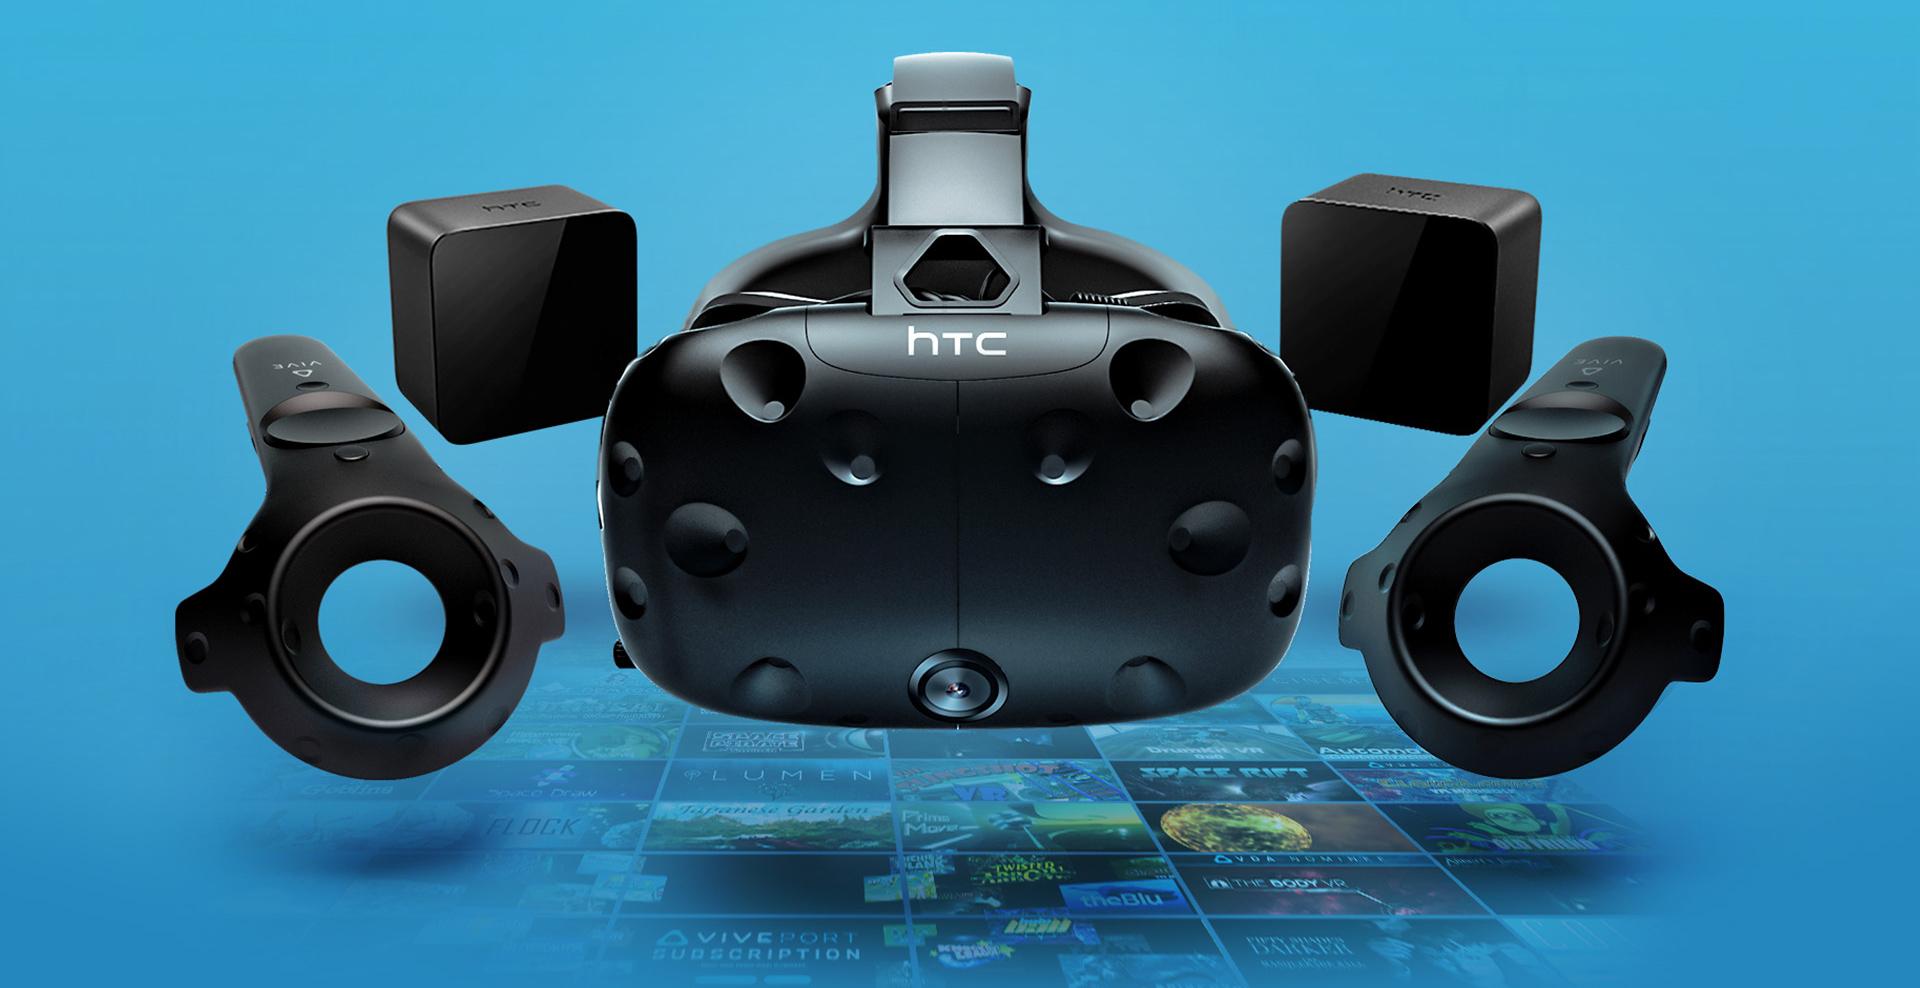 $200 price cut brings HTC Vive down to $599 screenshot